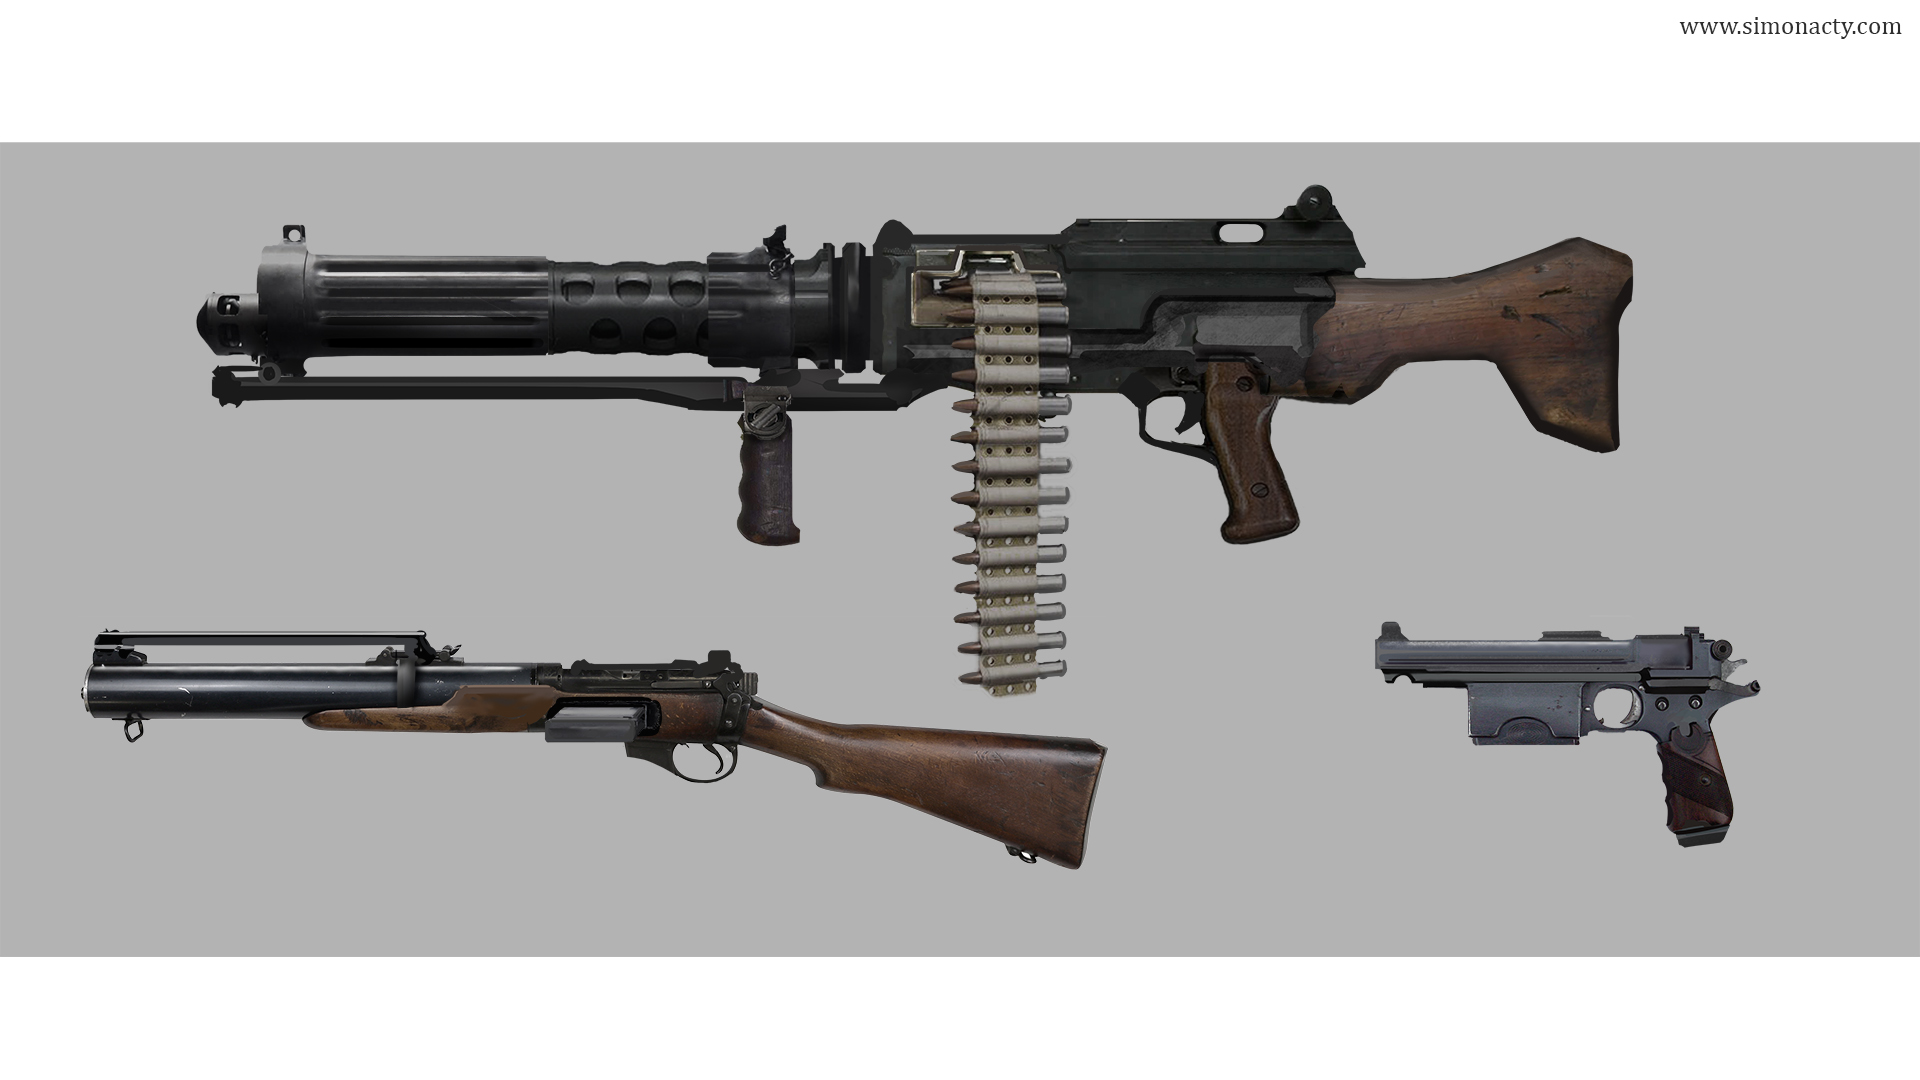 Gun_exploration_02.jpg